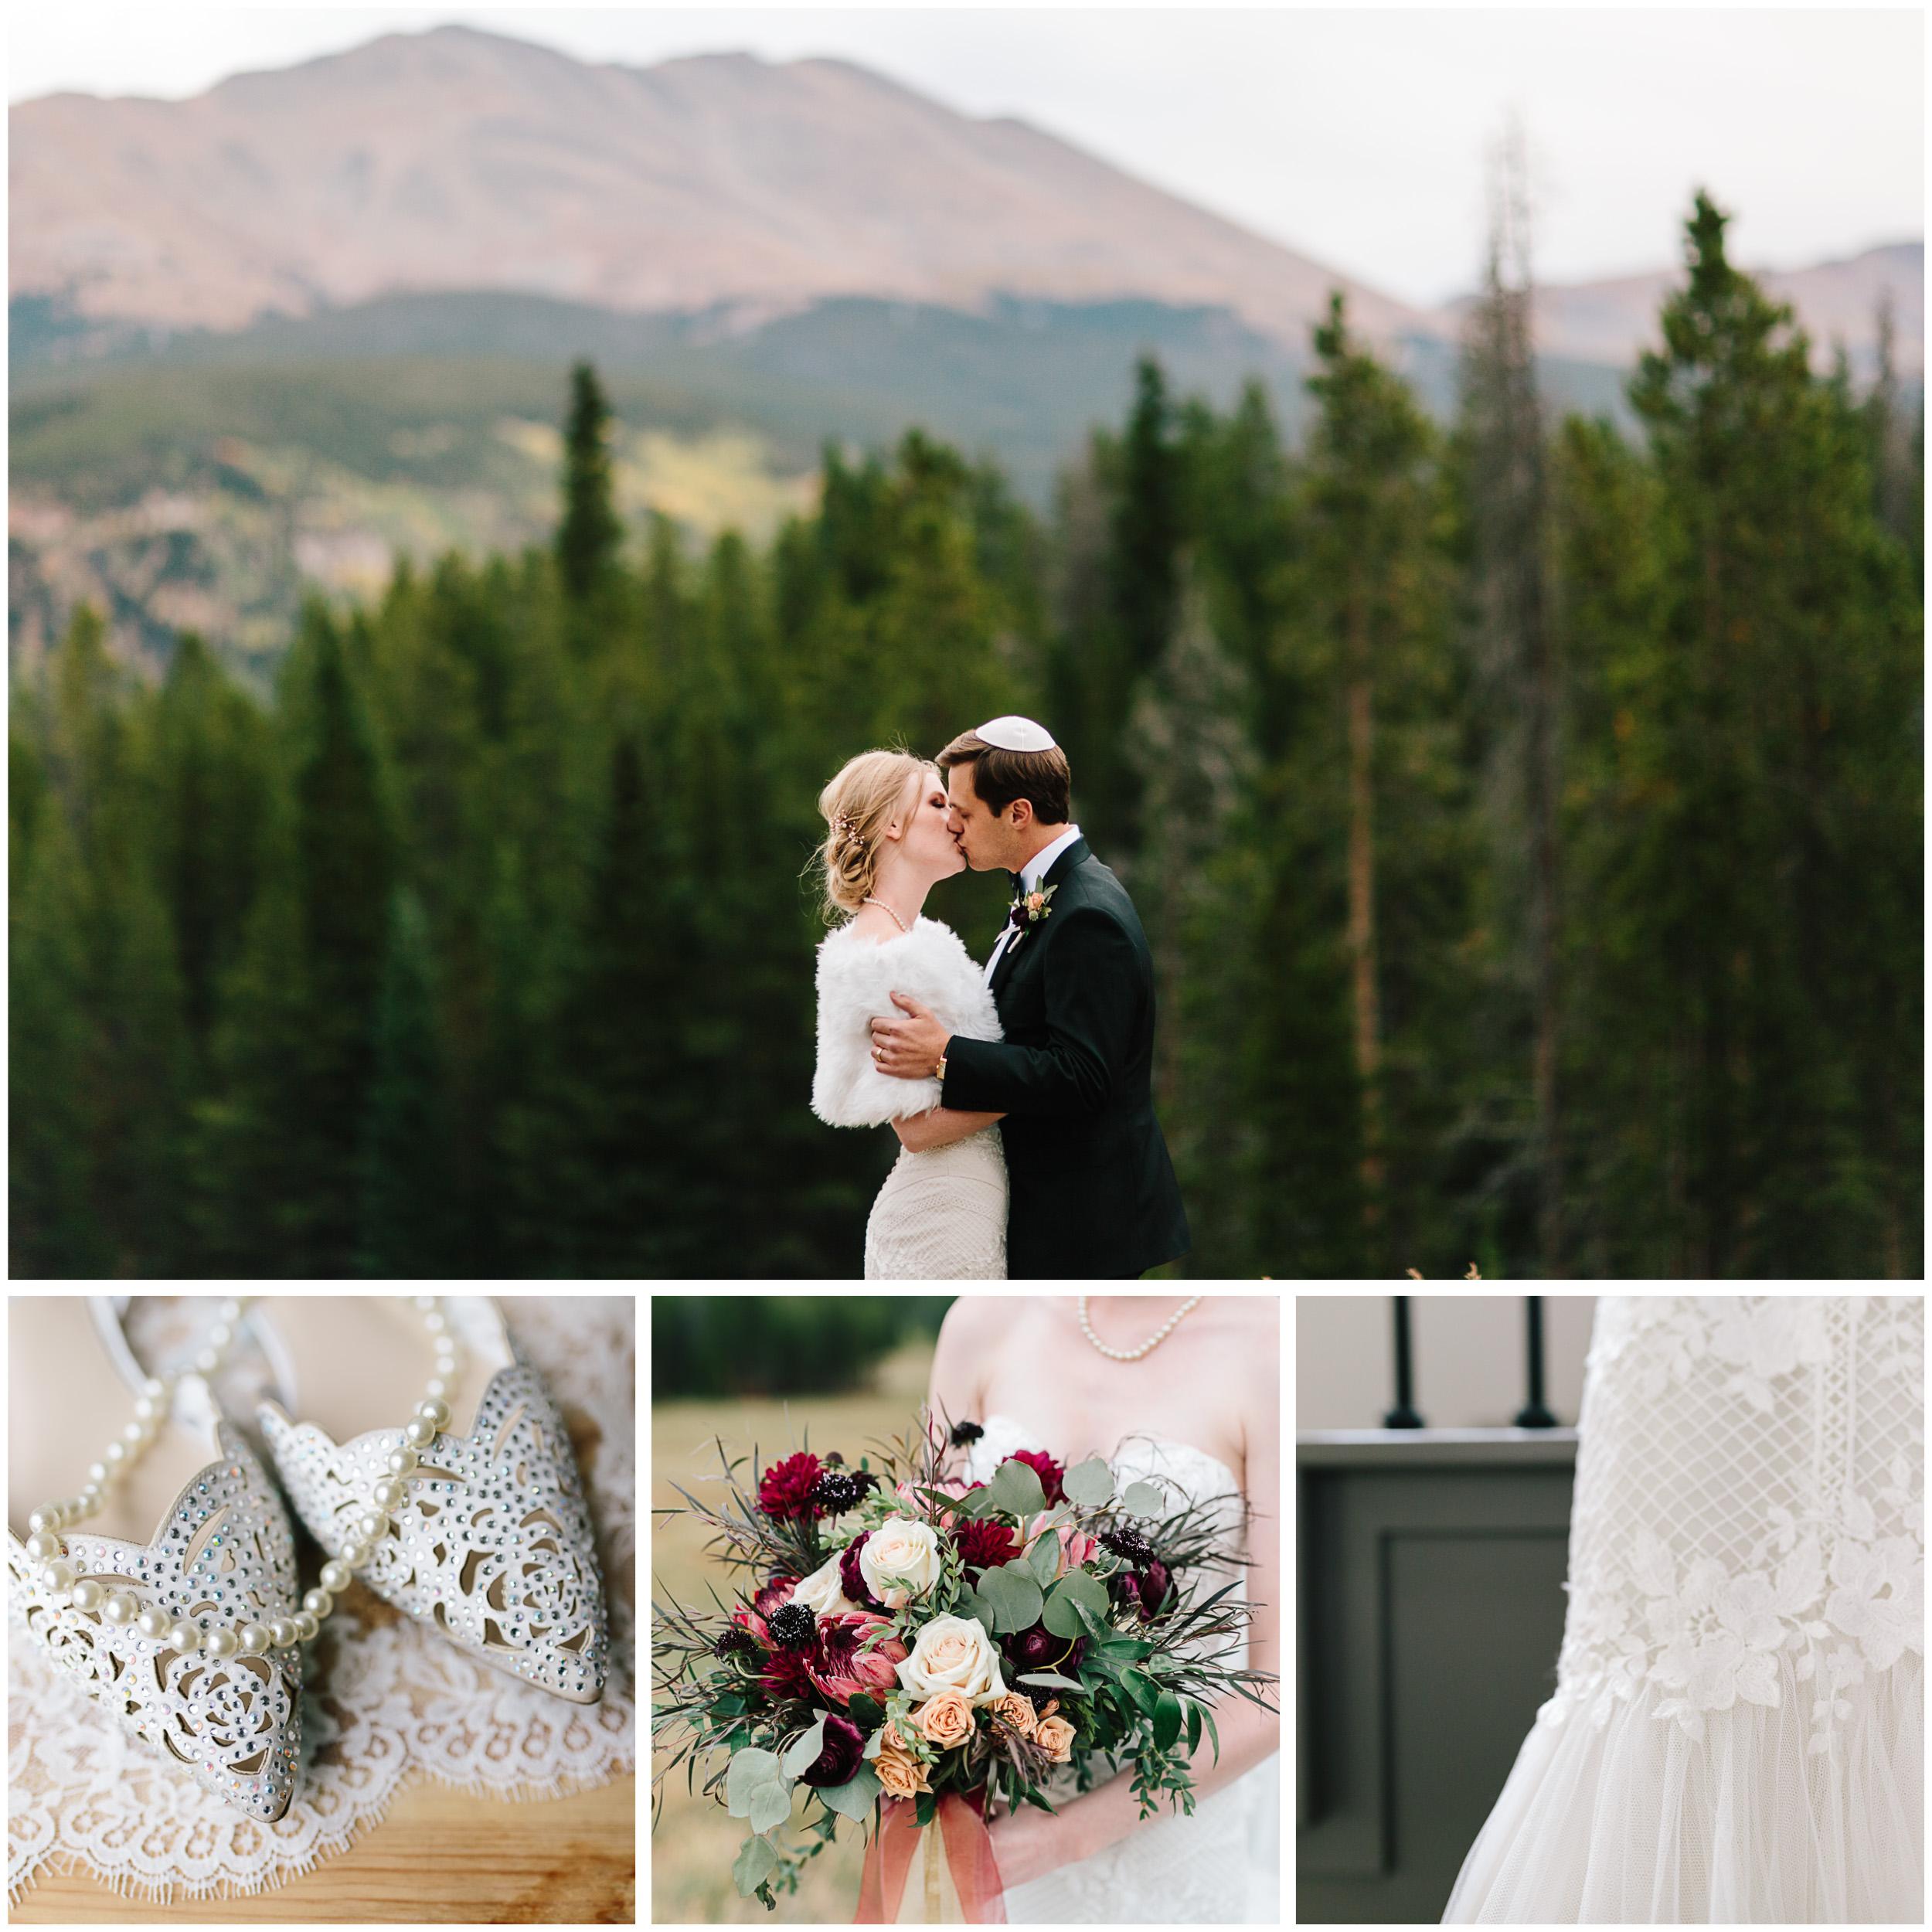 ten_mile_station_wedding_header.jpg